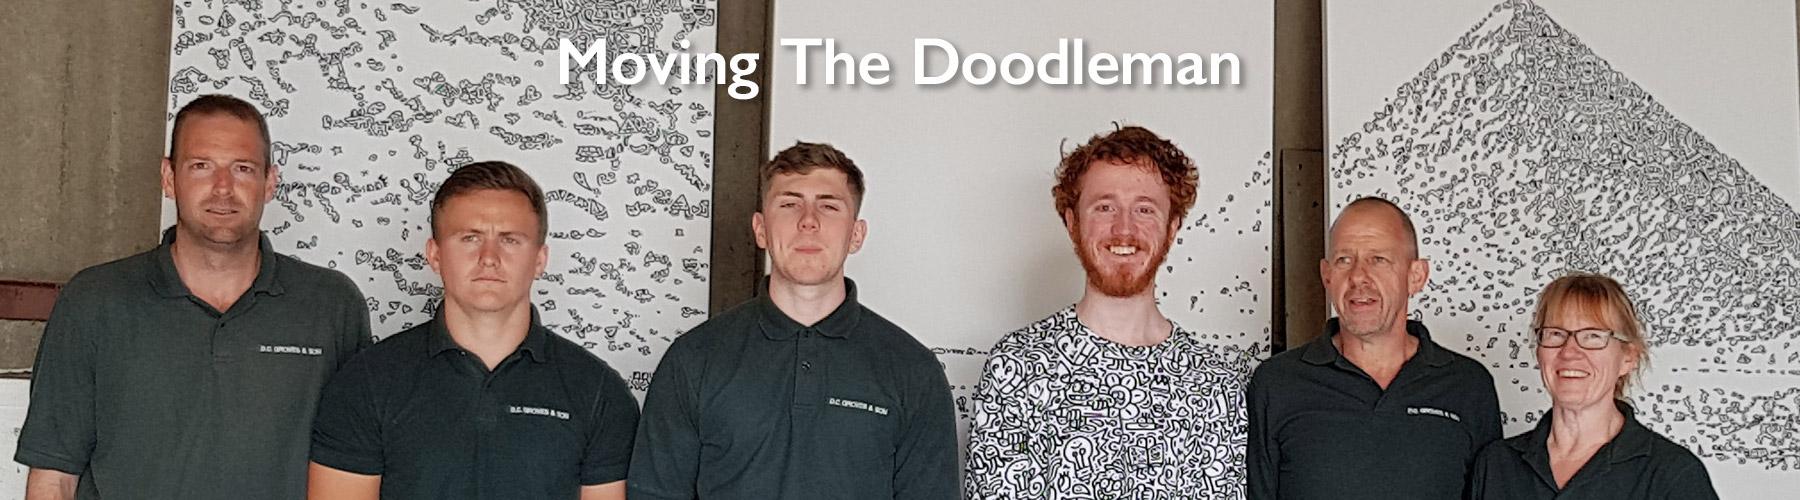 The Doodleman